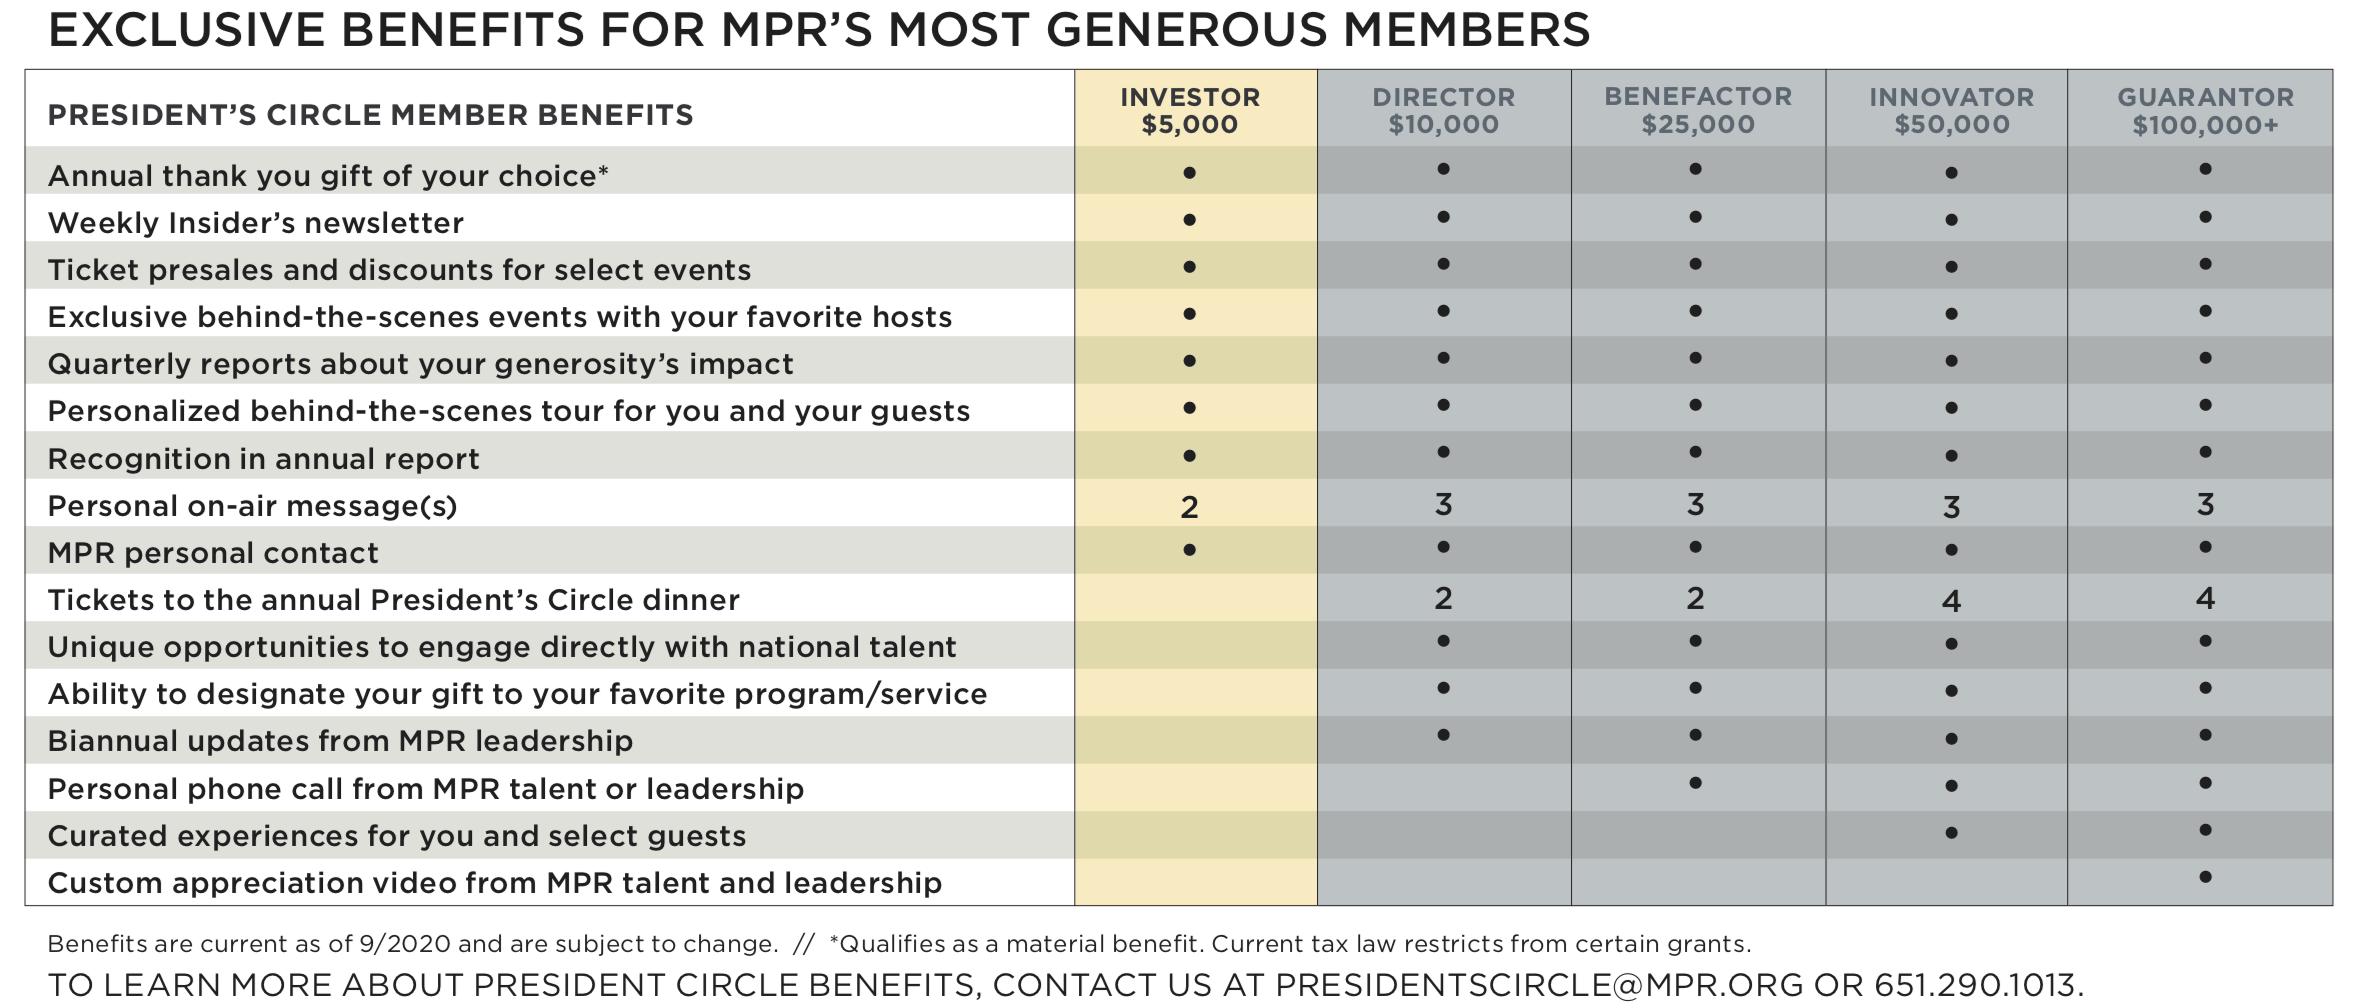 President's Circle Member Benefits Chart